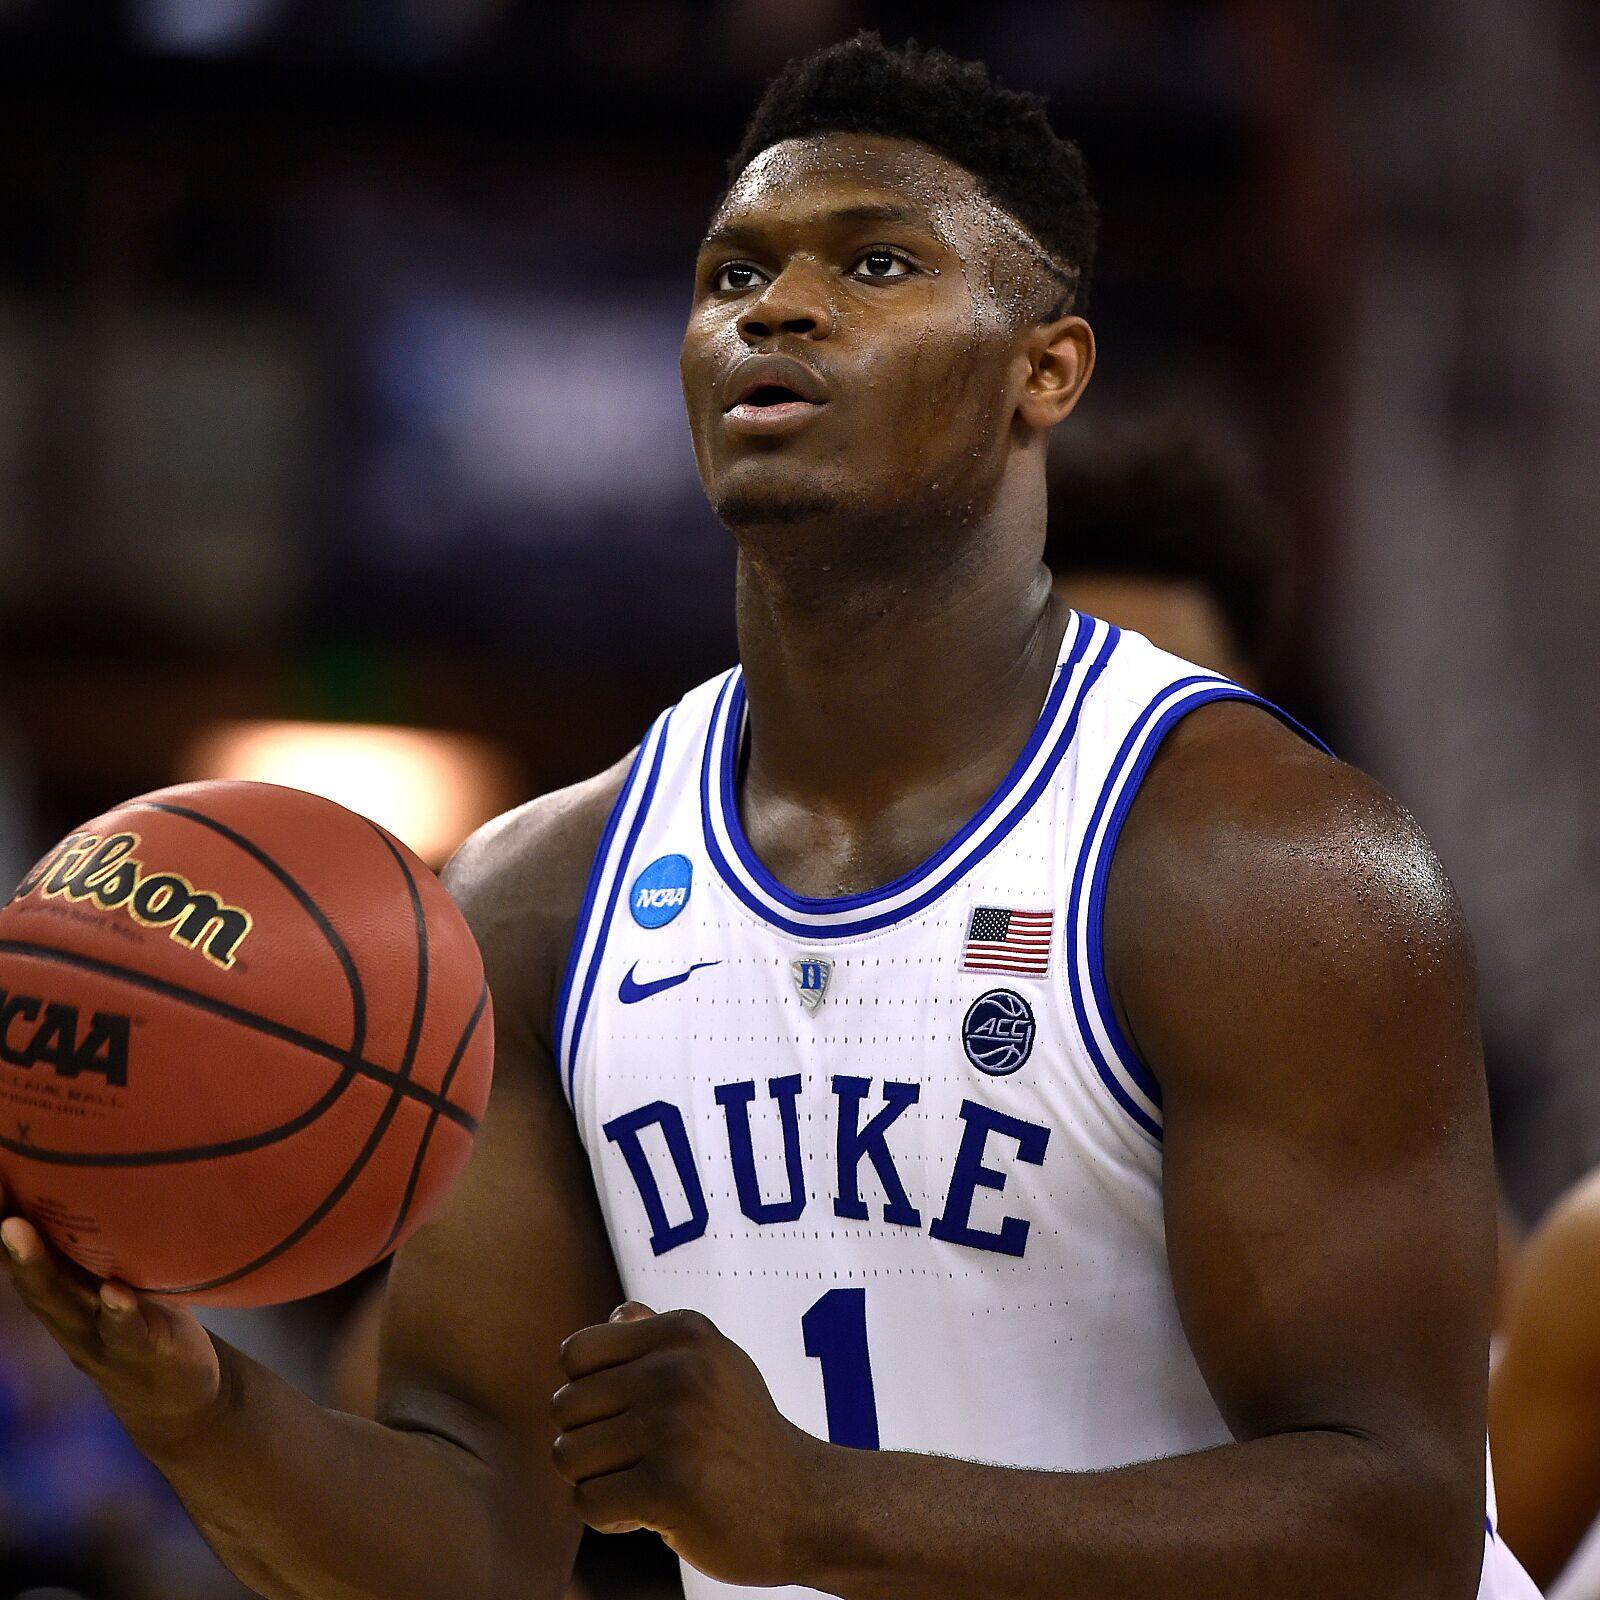 2019 NBA Draft: 5 Reasons Atlanta Hawks Should Draft Zion